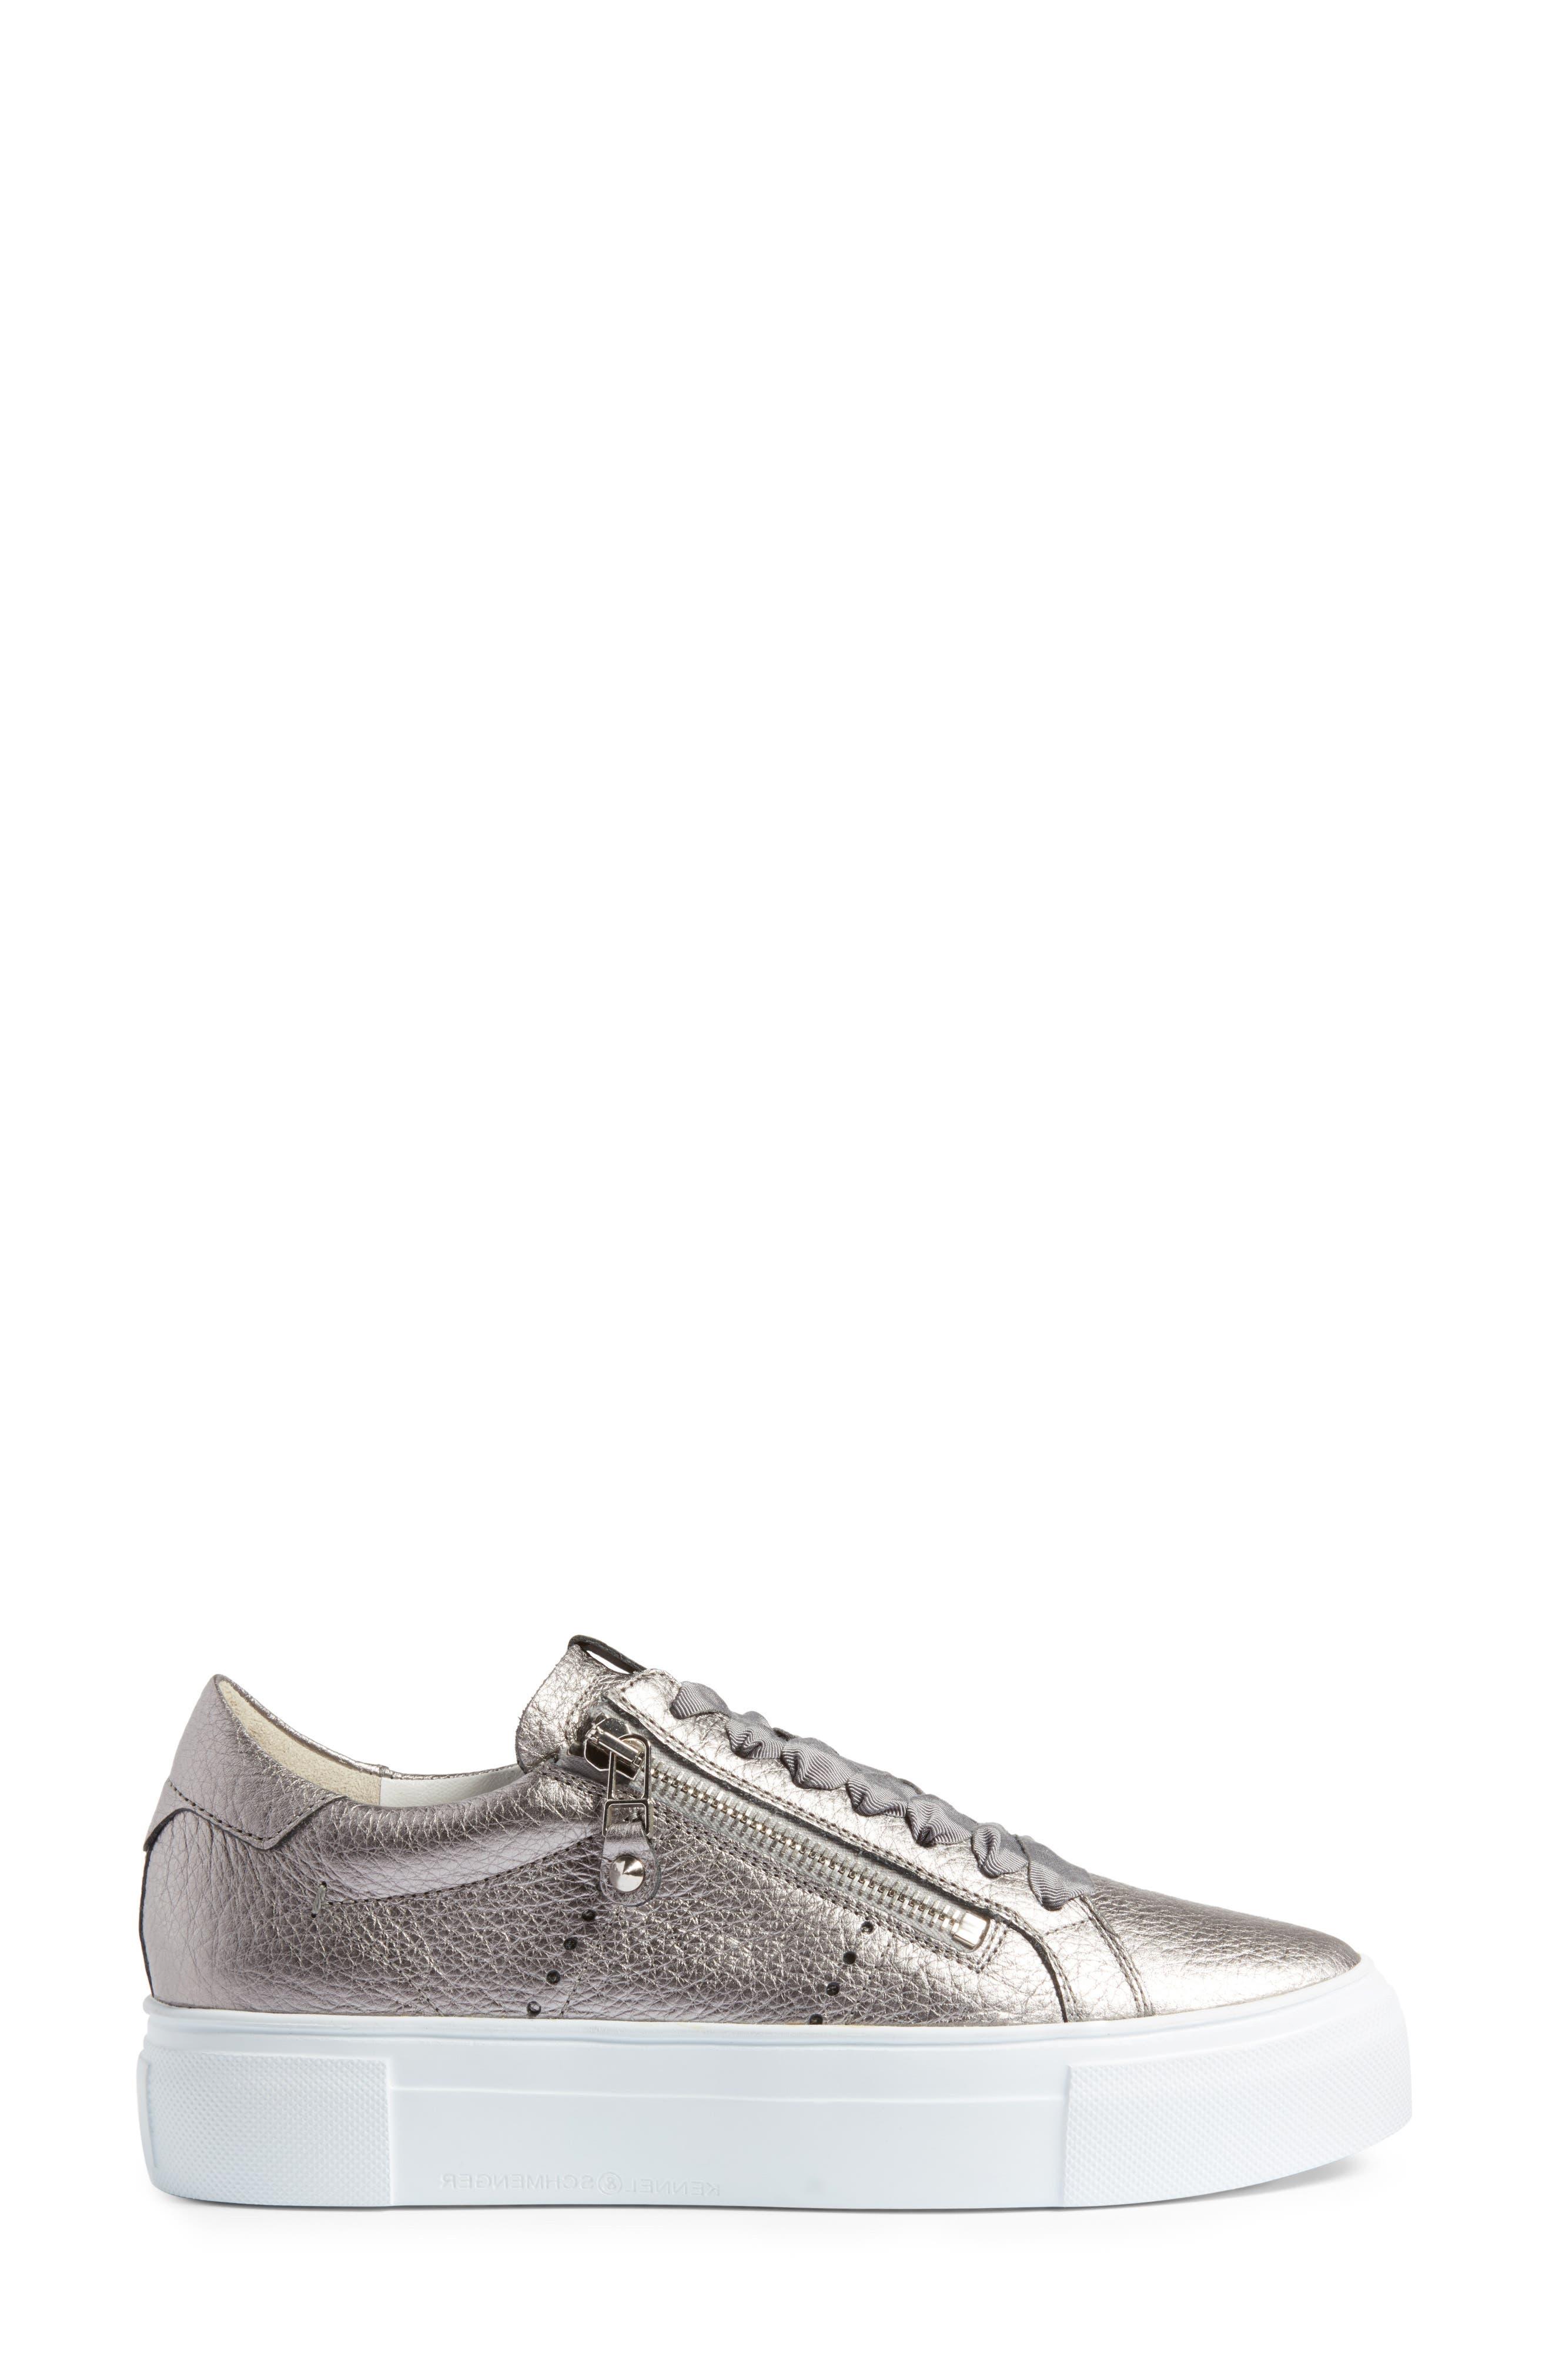 Kennel & Schmenger Big Low Top Platform Sneaker,                             Alternate thumbnail 3, color,                             020